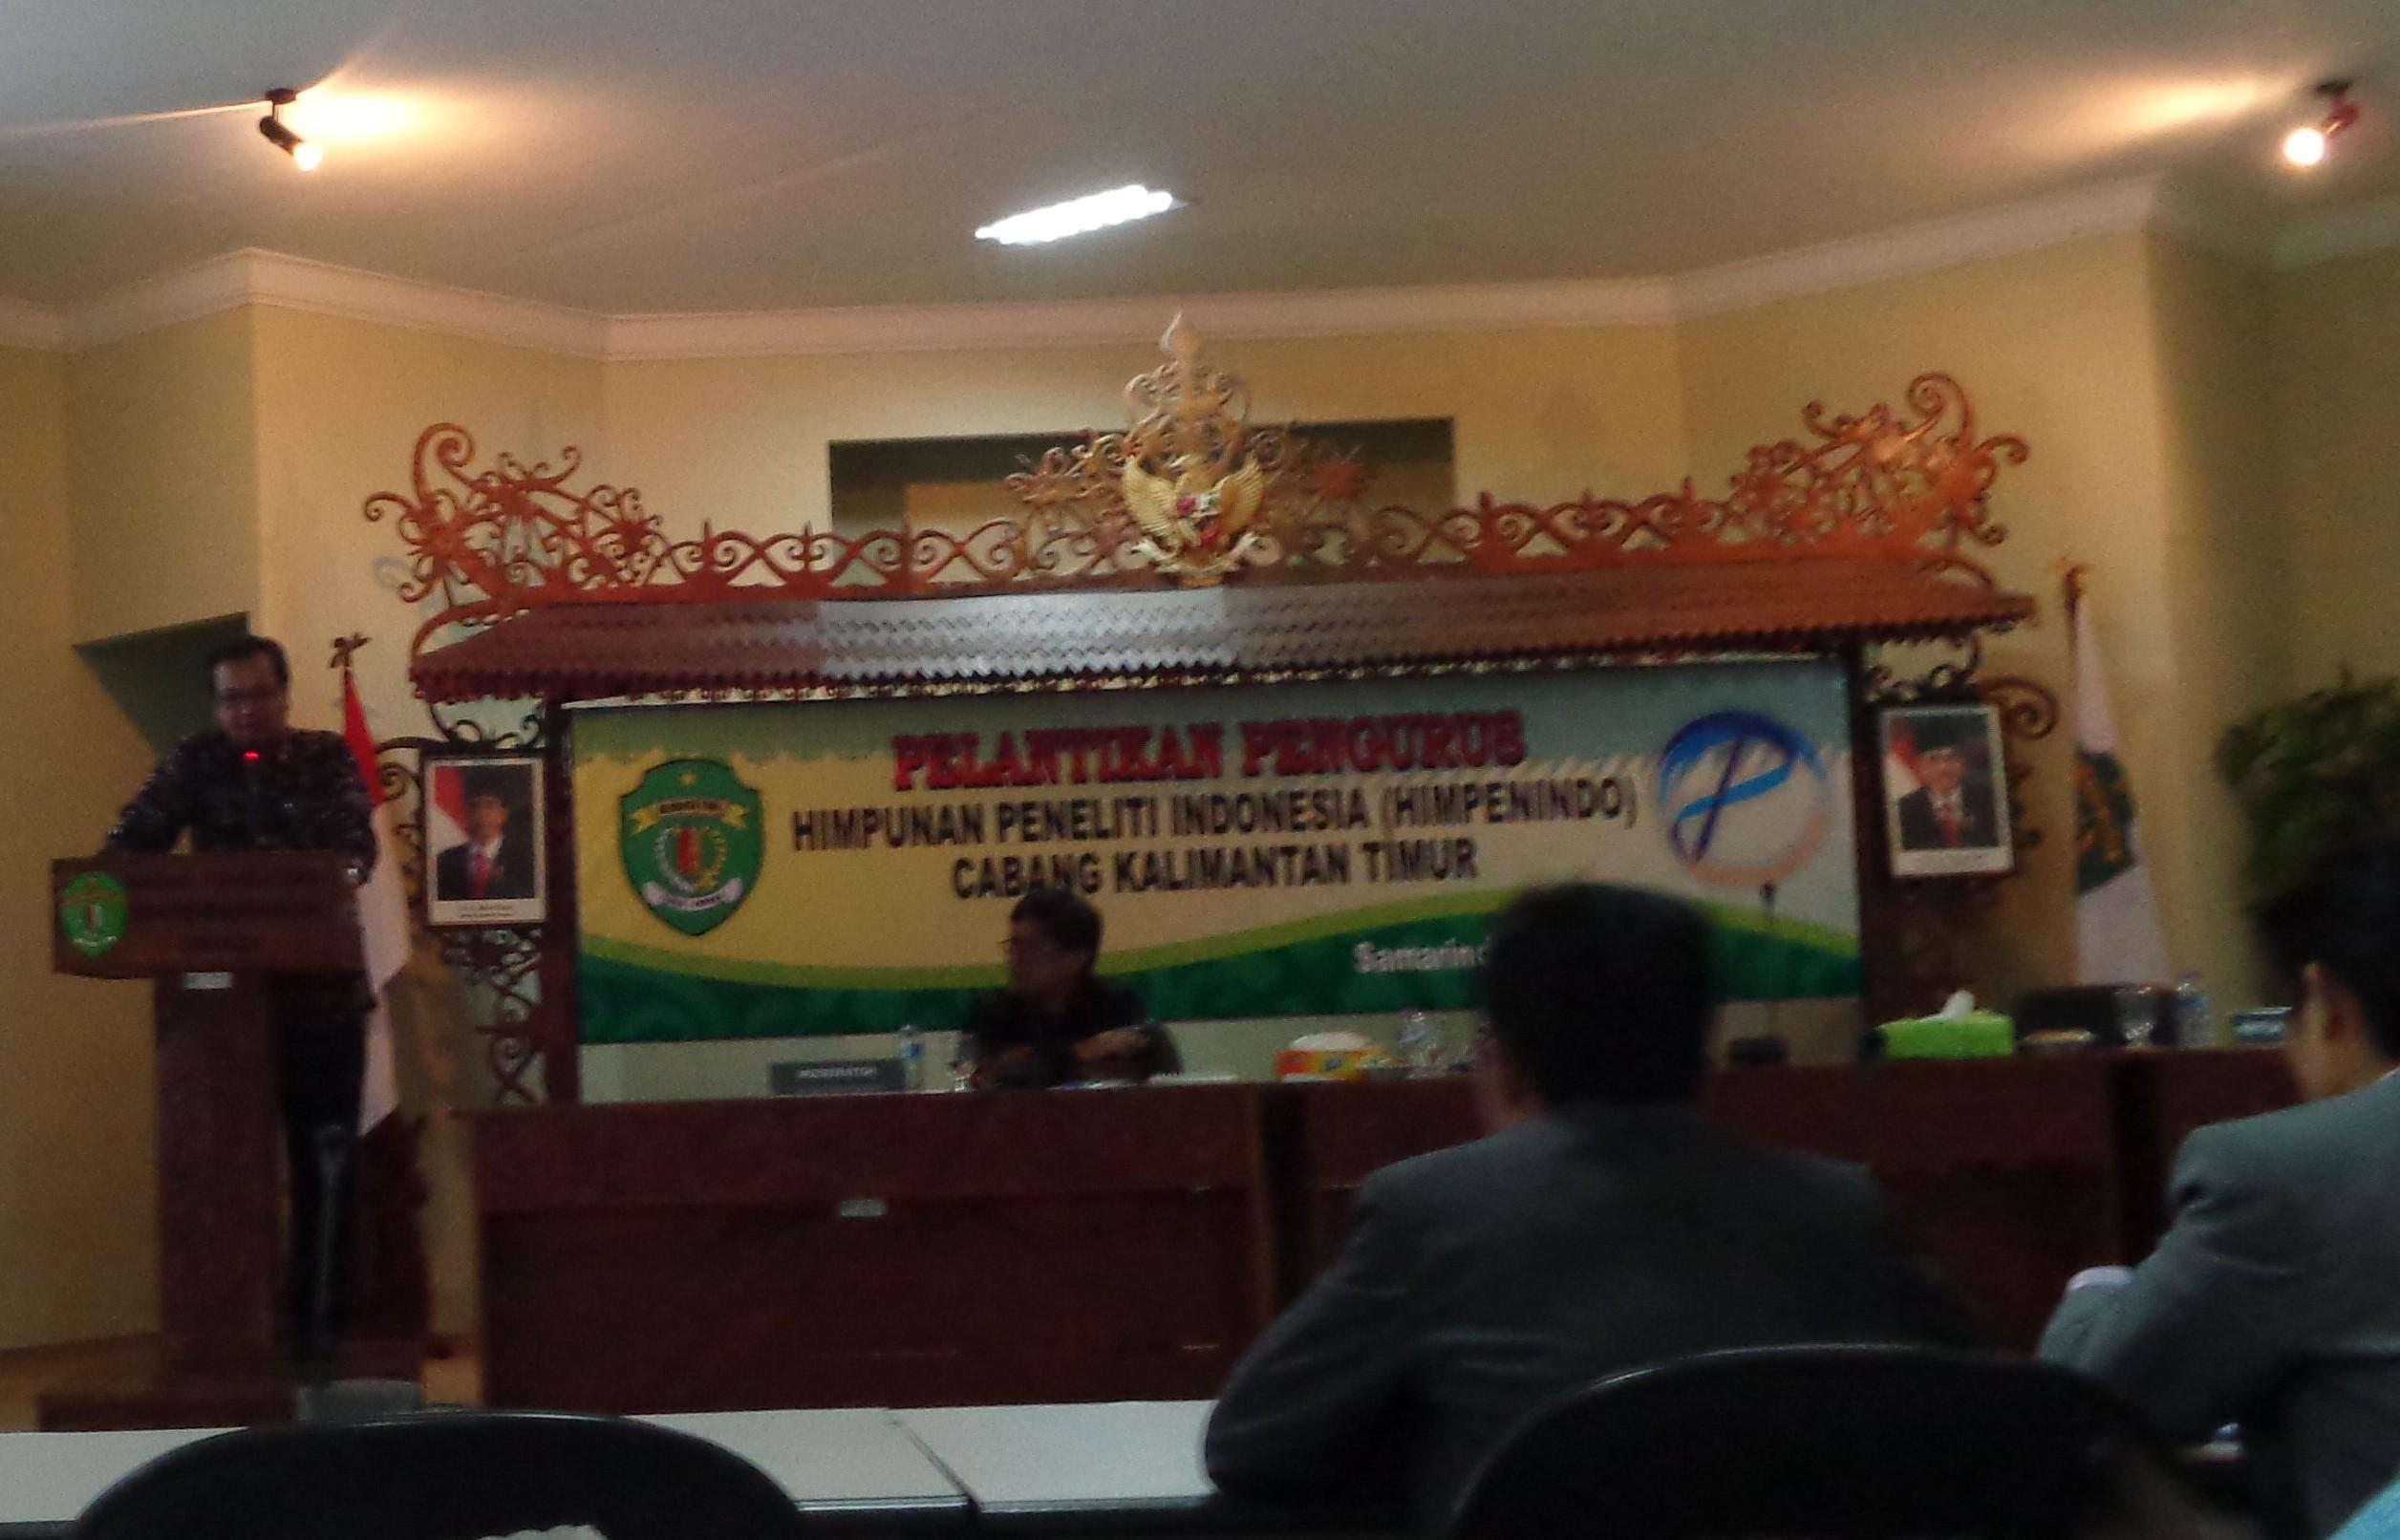 Pelantikan Pengurus HIMPENINDO cabang Kalimantan Timur